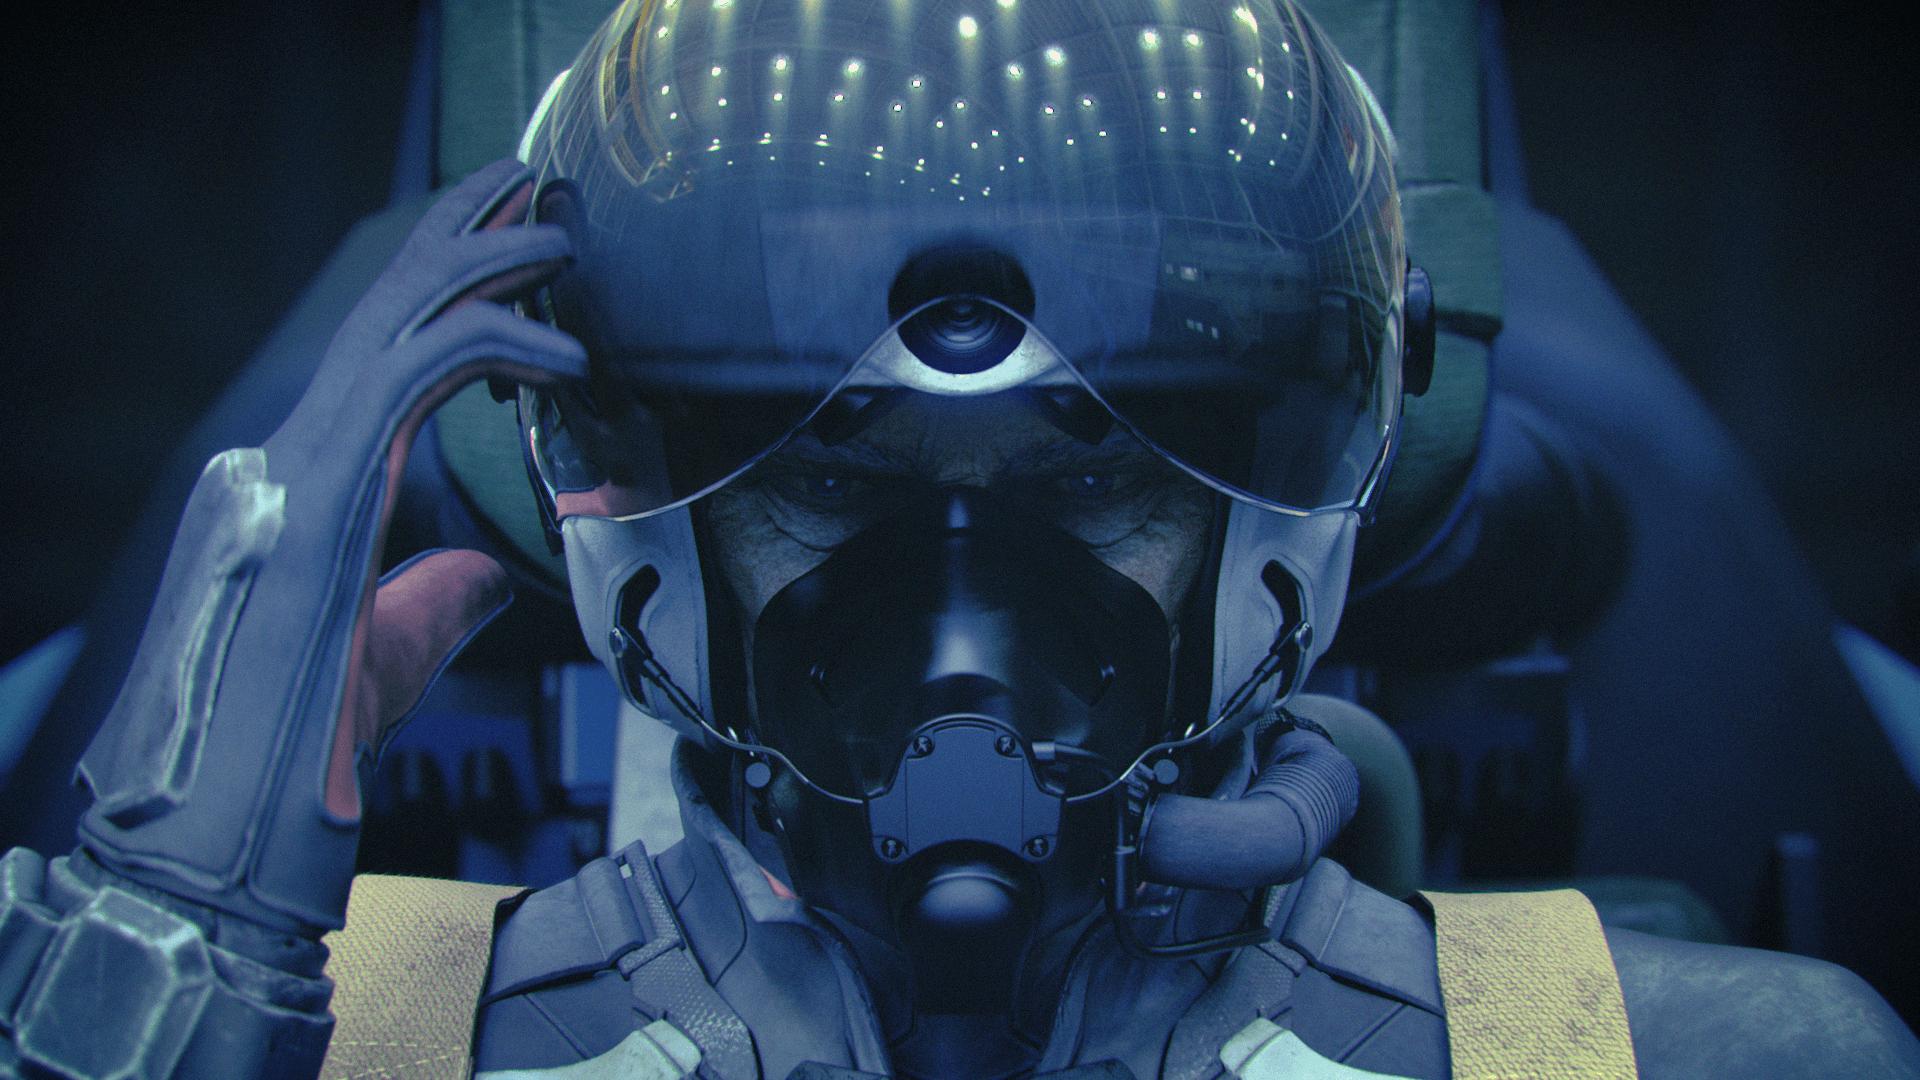 Foto de Ace Combat 7: Skies Unknown ganhou gameplay de duas missões